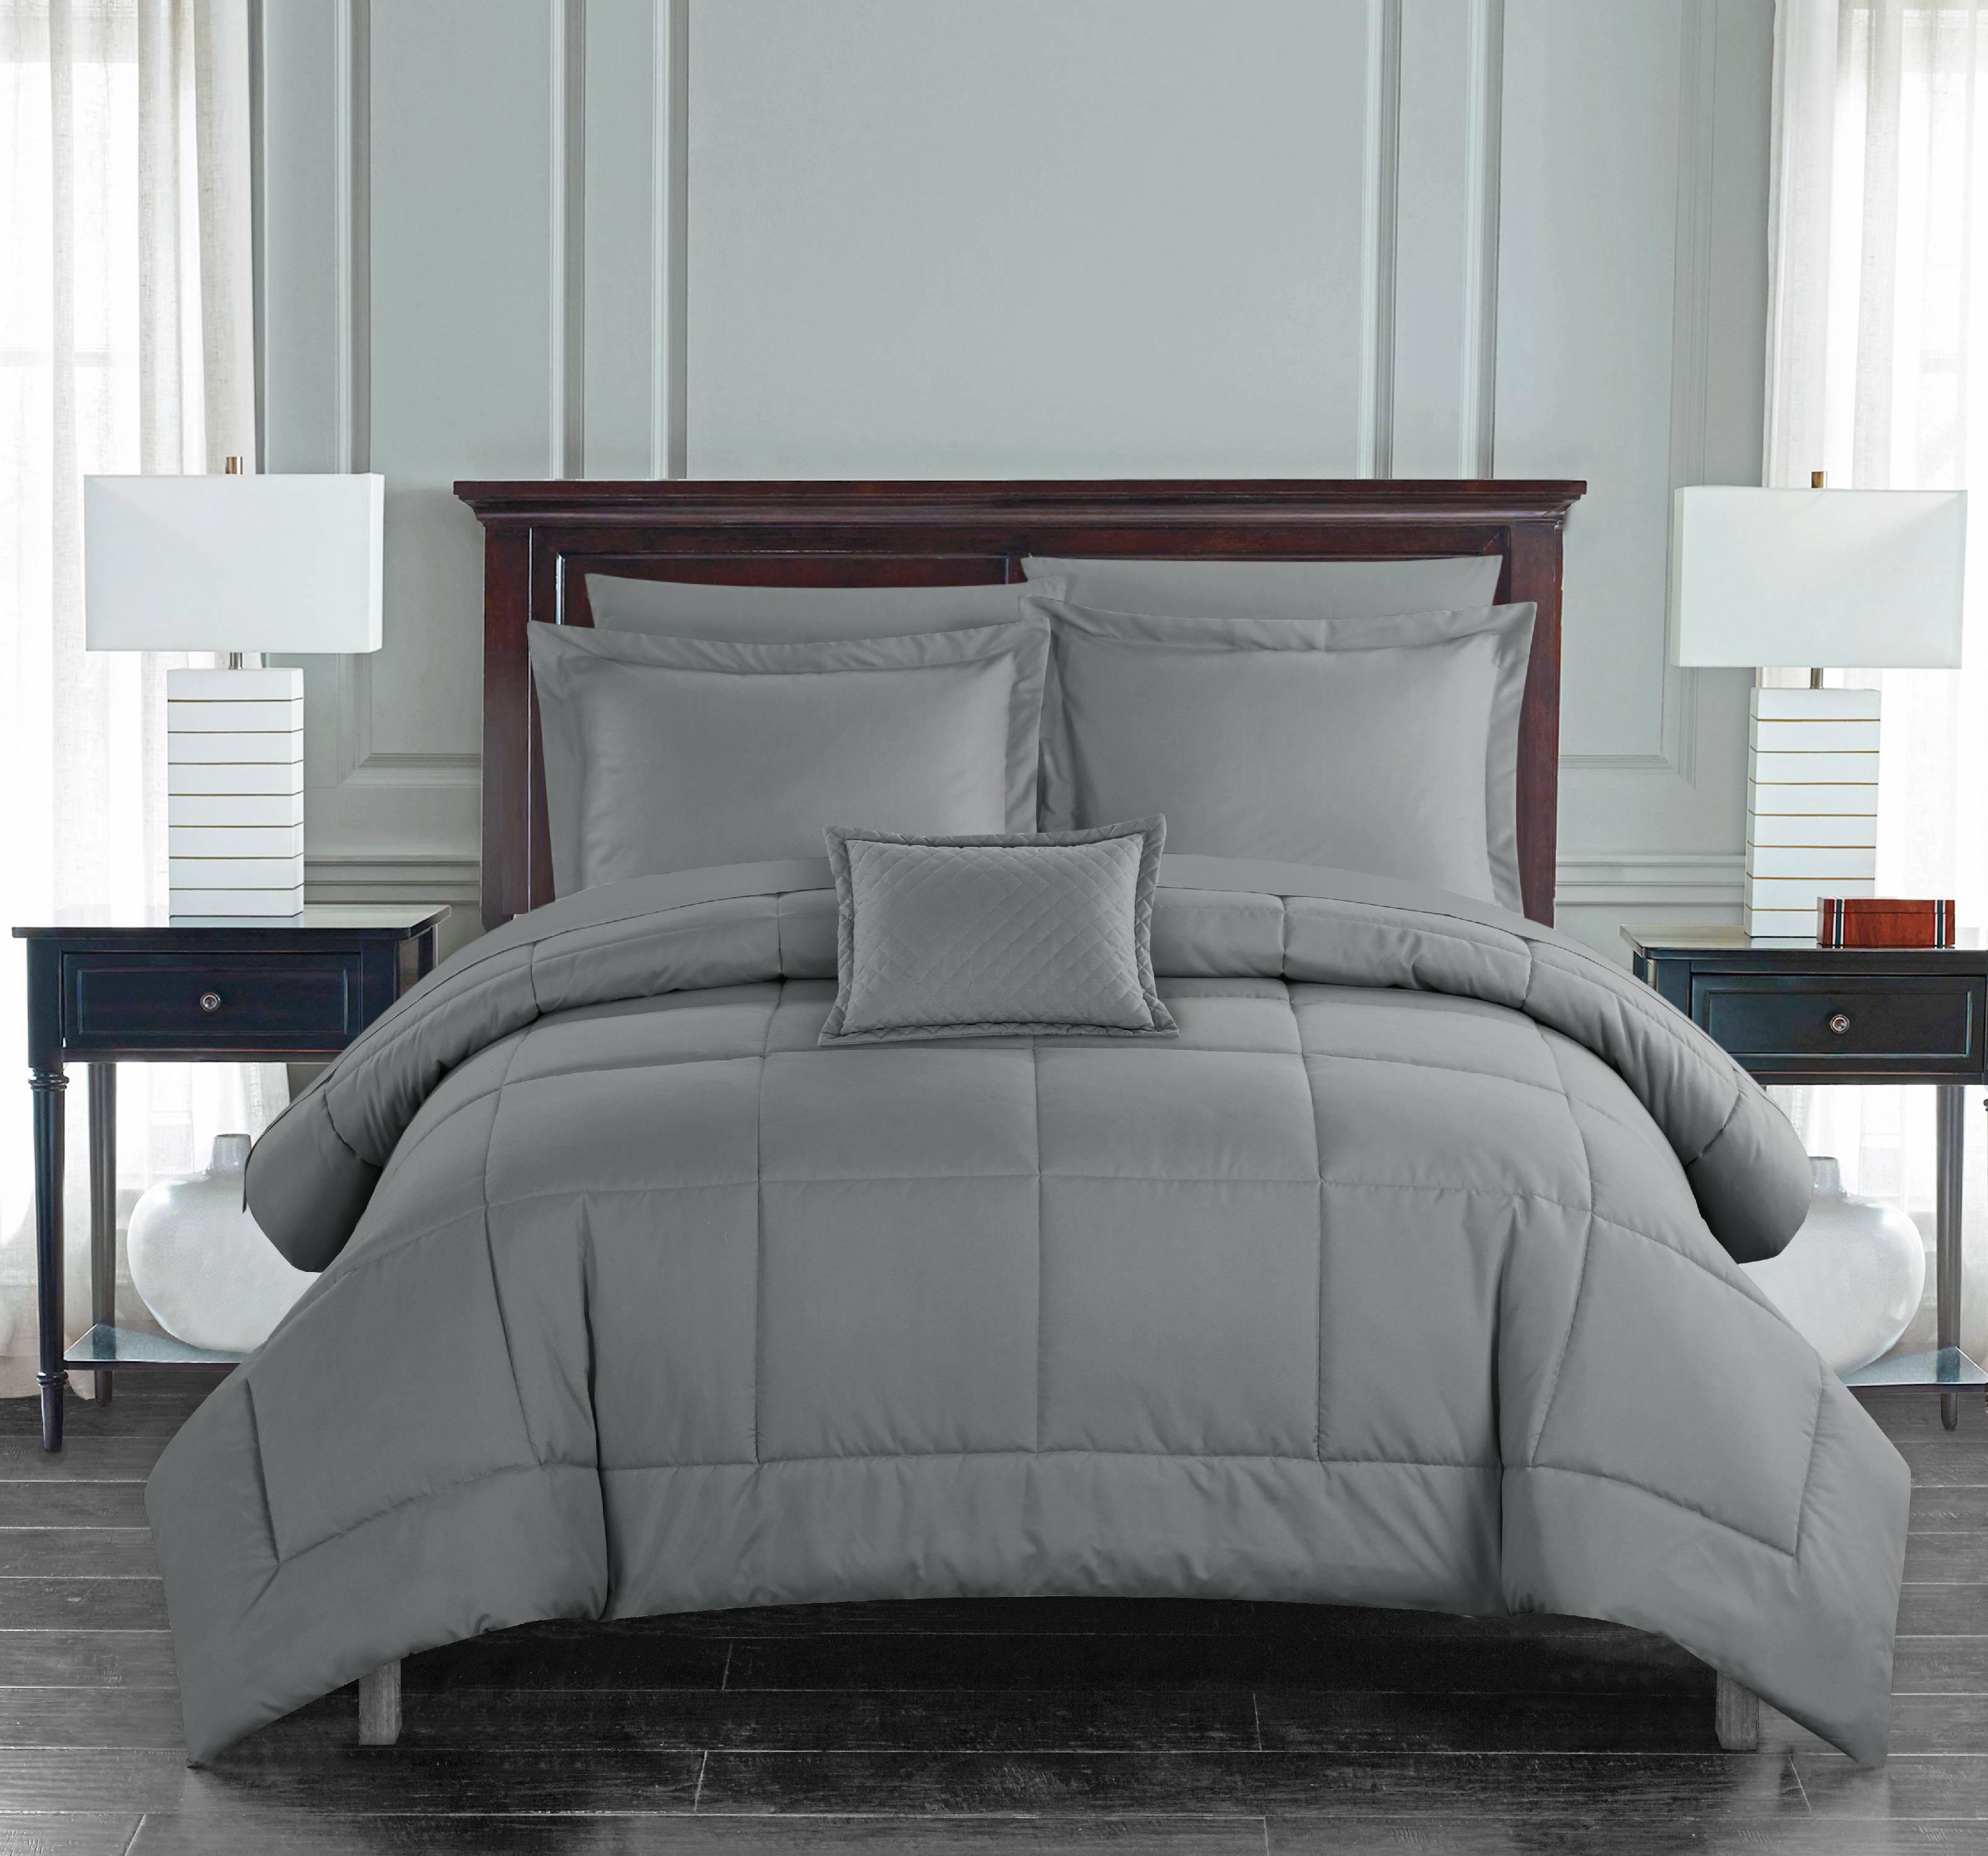 Chic Home Jorin 8 Piece Bed in a Bag Comforter Set